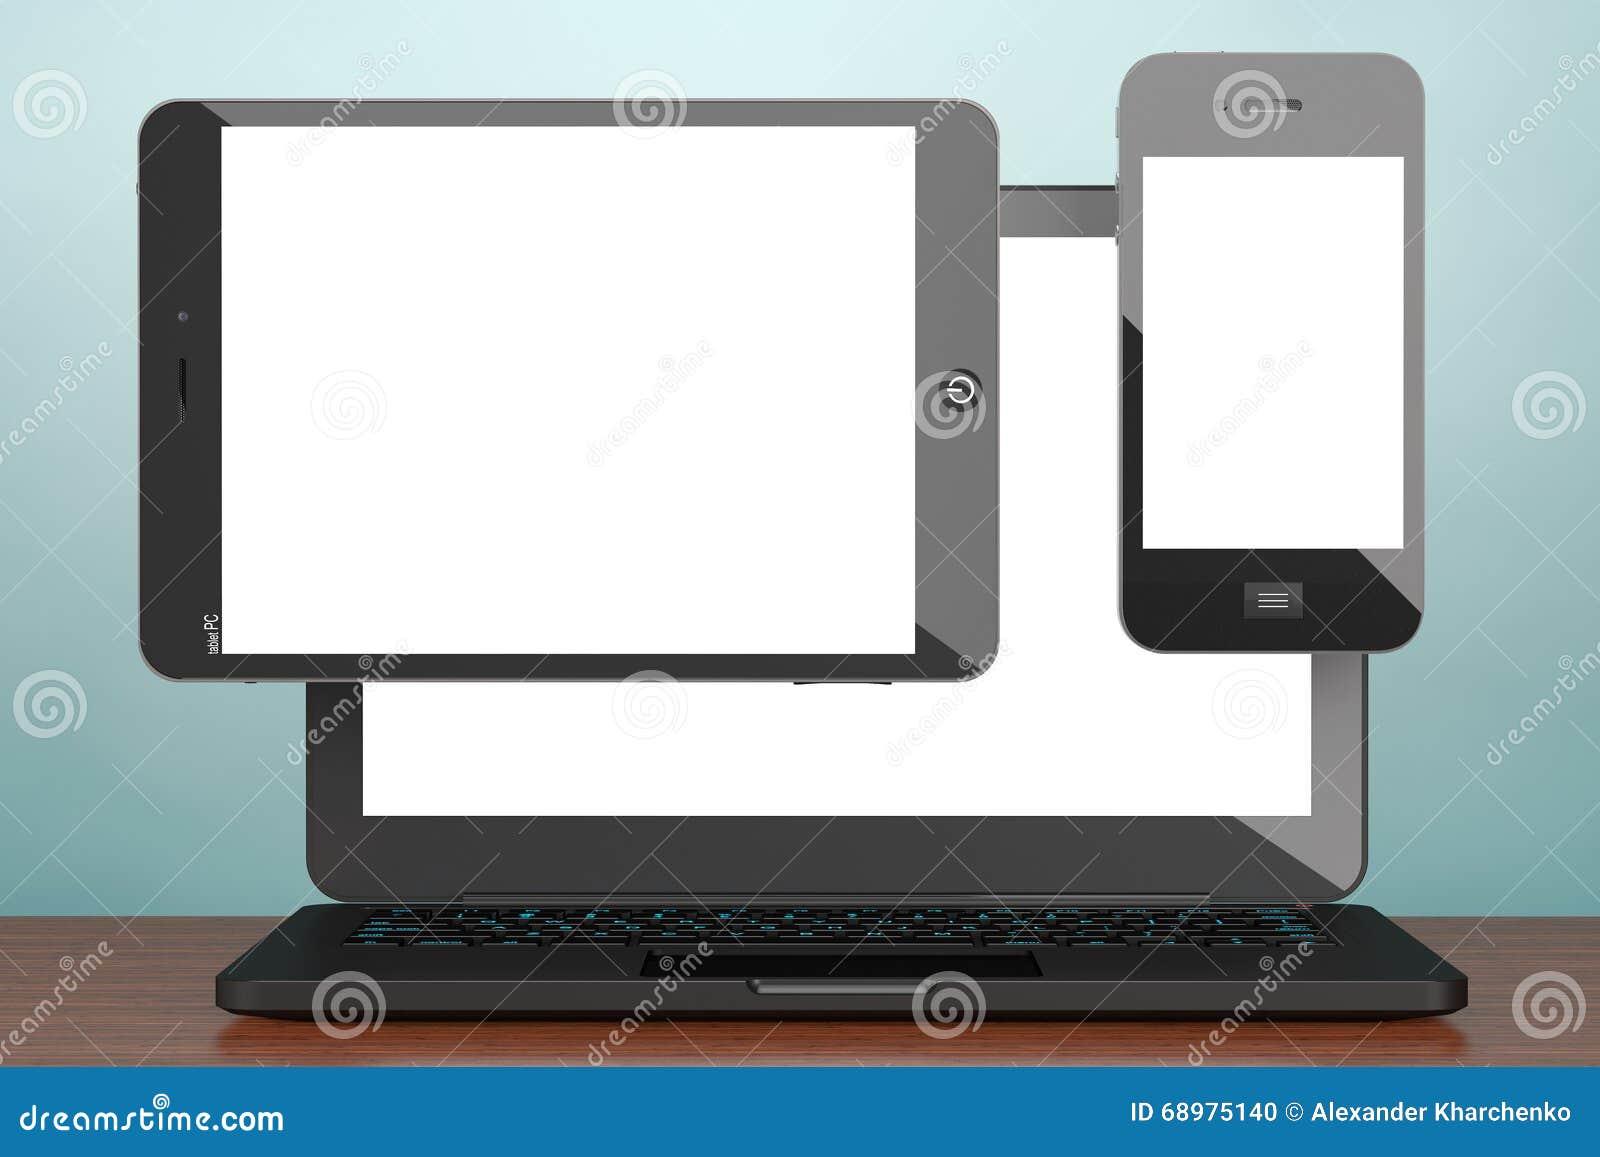 Foto del viejo estilo Ordenador portátil, teléfono móvil y PC de la tableta renderin 3D